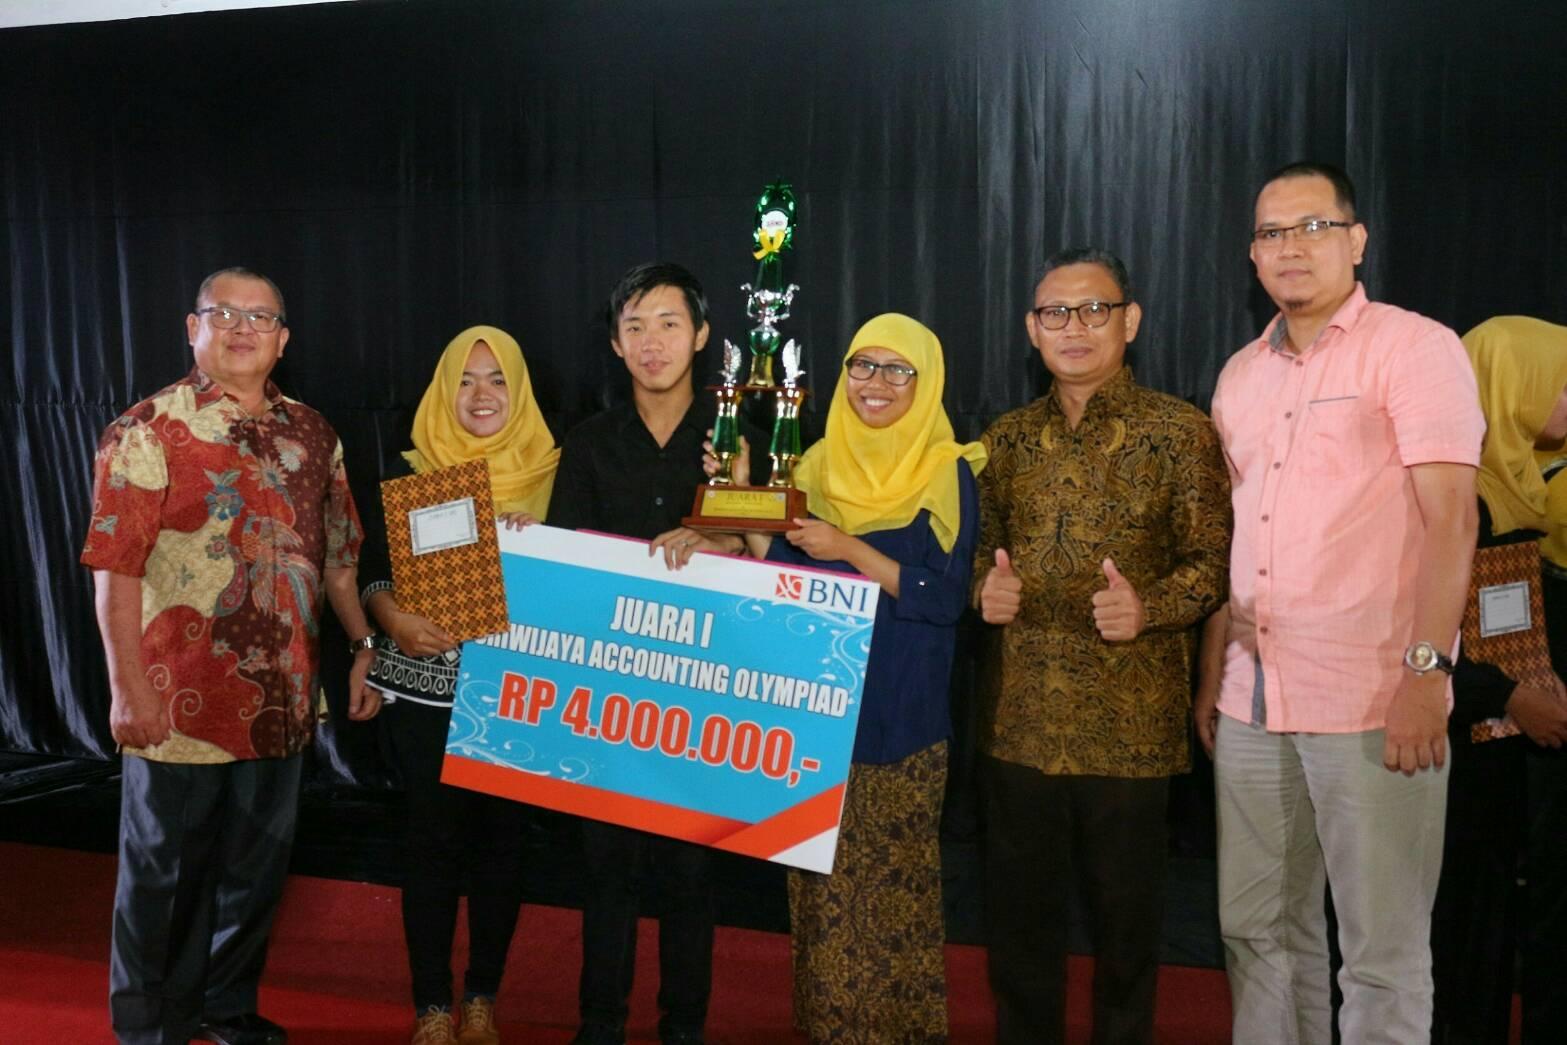 Tim S1 Akuntansi Raih Juara 1 Sriwijaya Accounting Olympiad